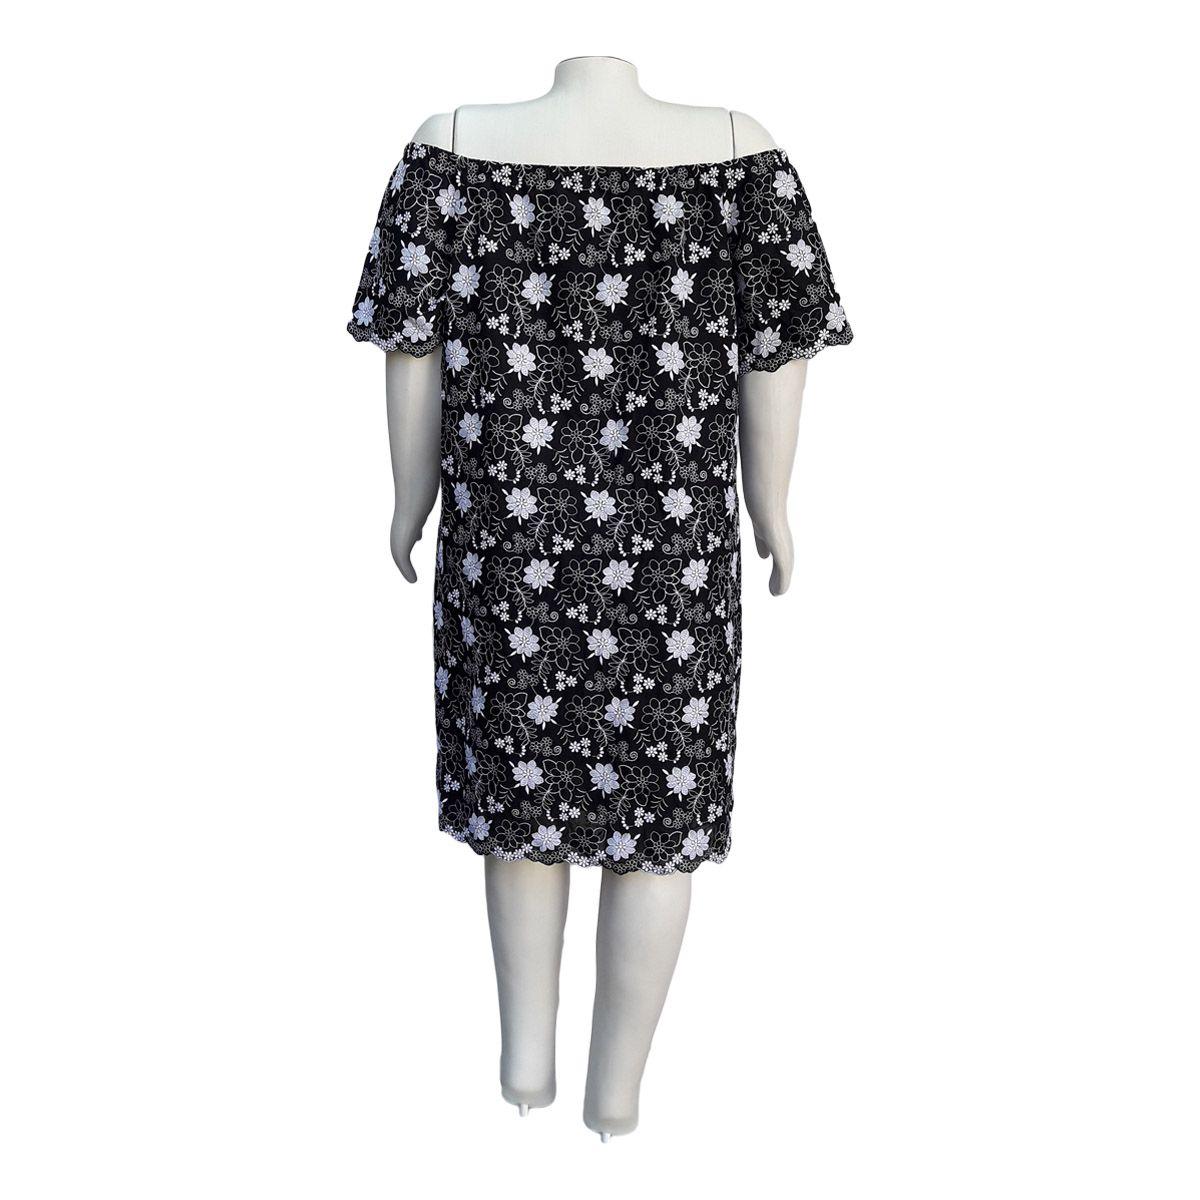 Vestido Cigana Laise Bordada Plus Size Moda Evangélica